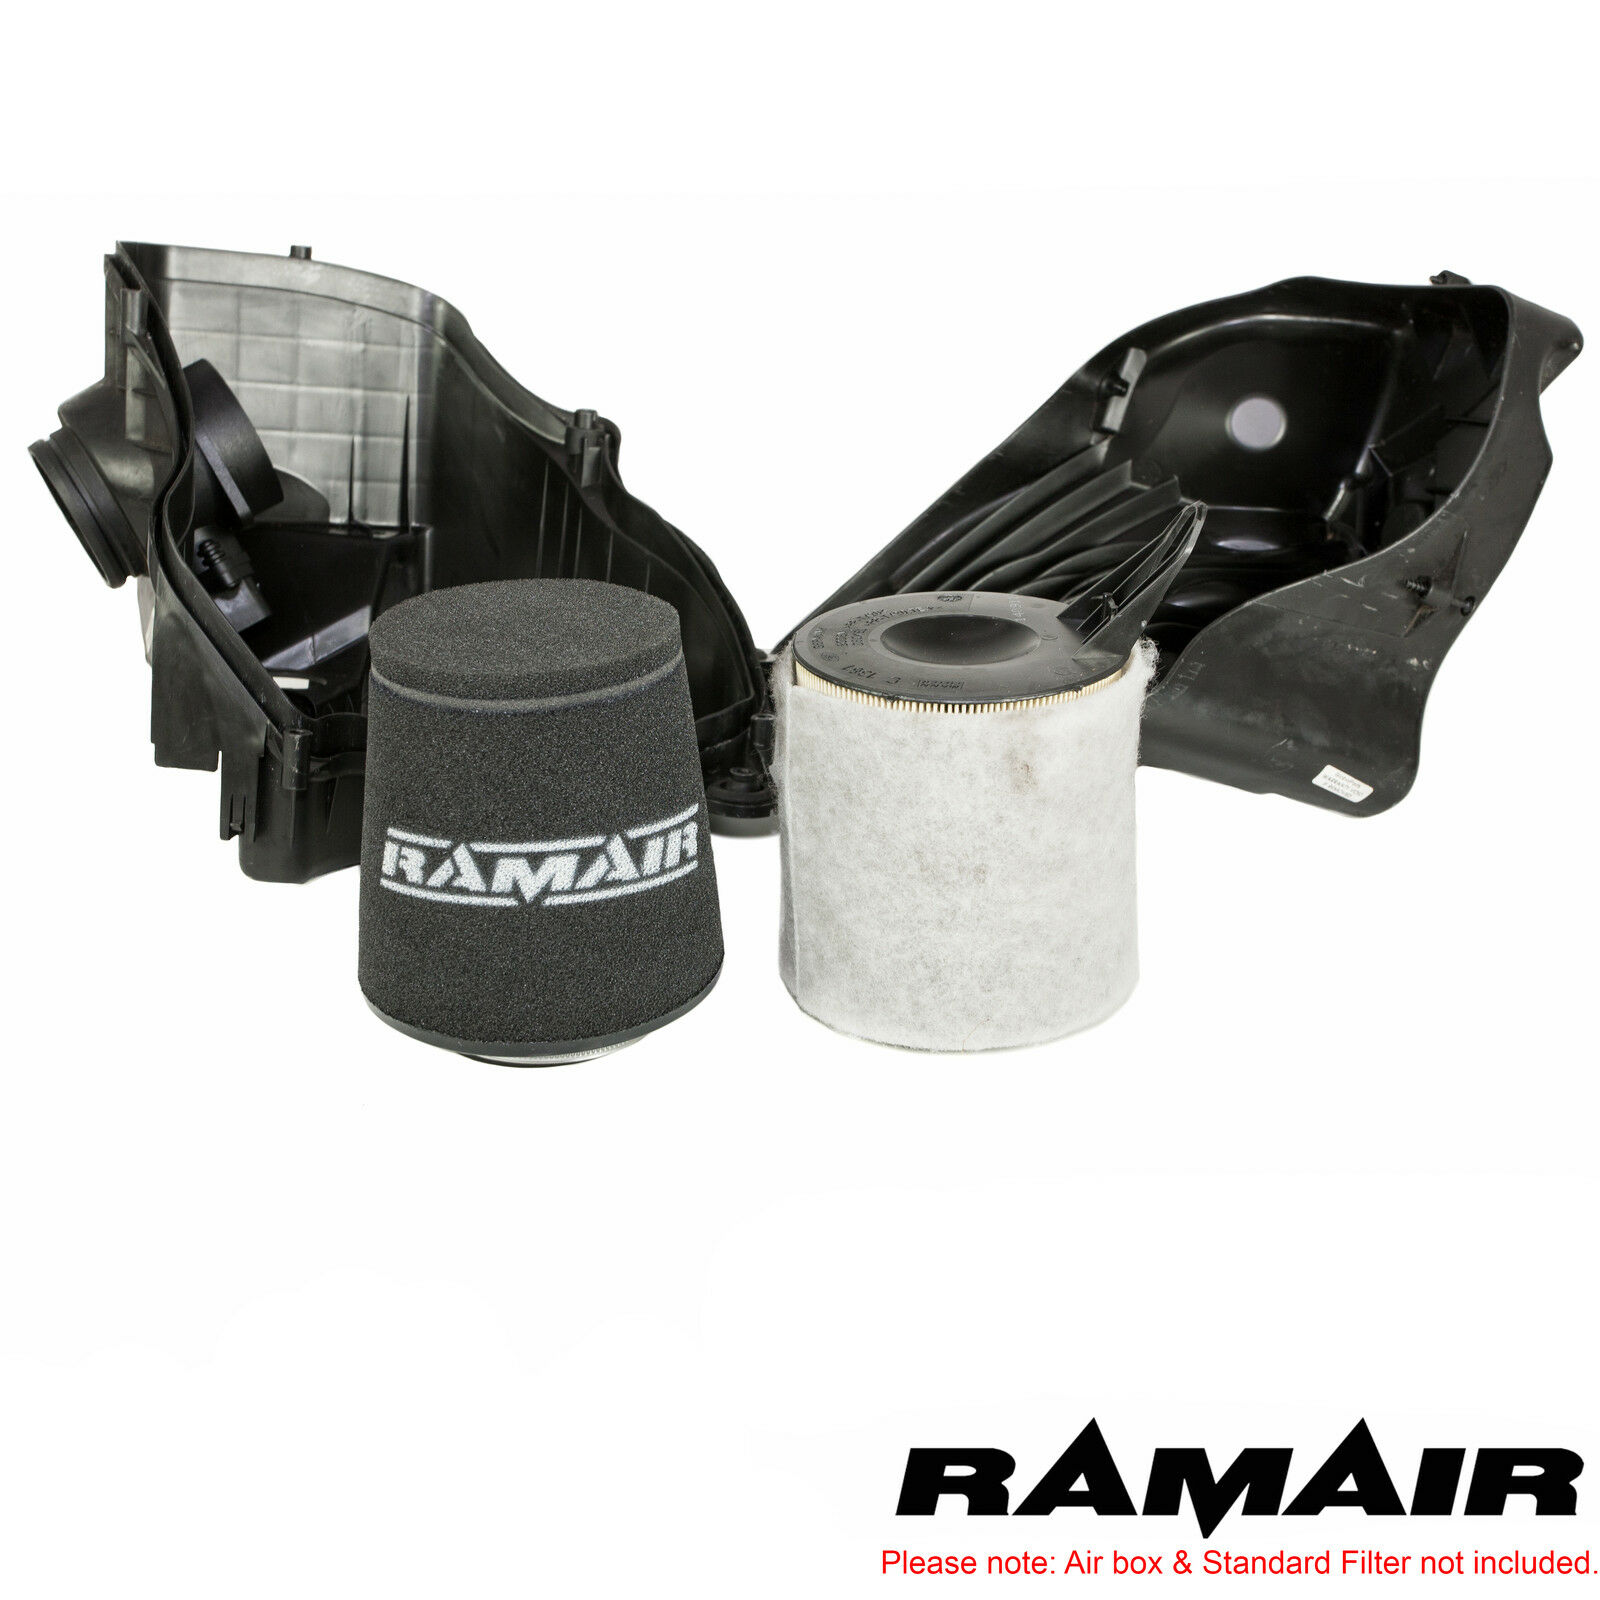 Filtri Ramair rpf-1233/performance Foam OEM replacement panel filtro aria